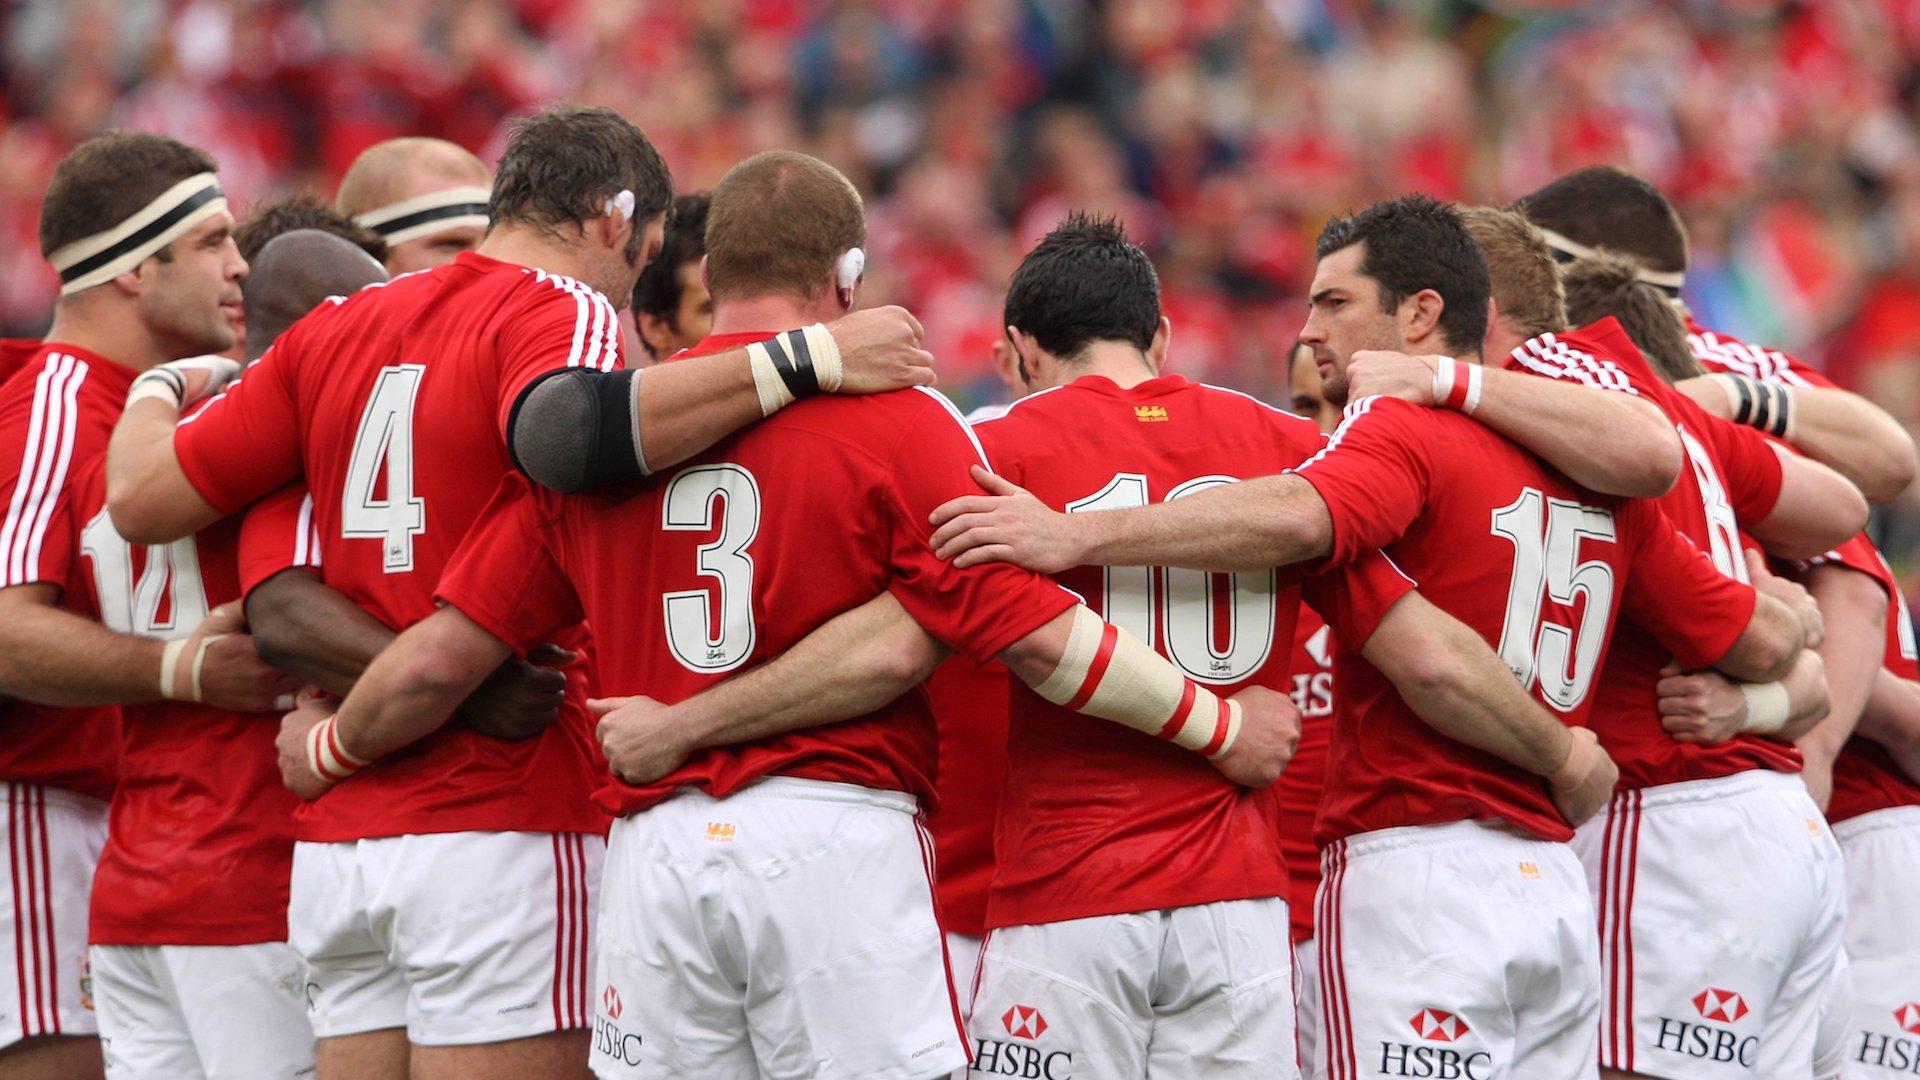 The British and Irish Lions team huddle